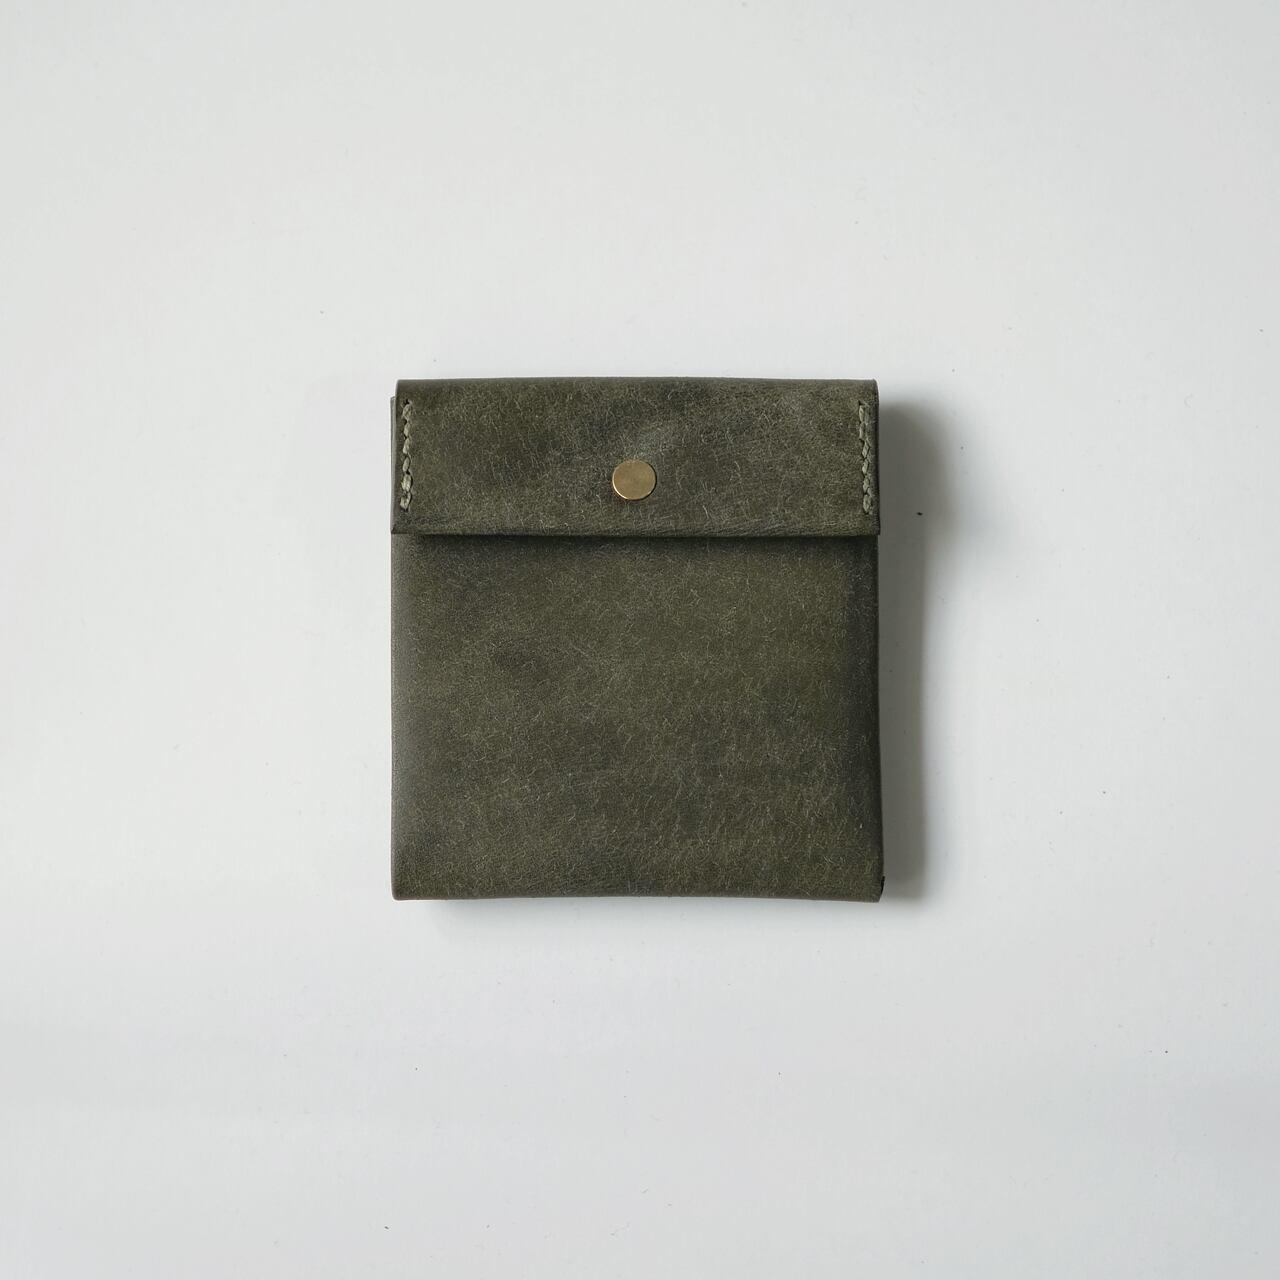 replica wallet - gri - プエブロ